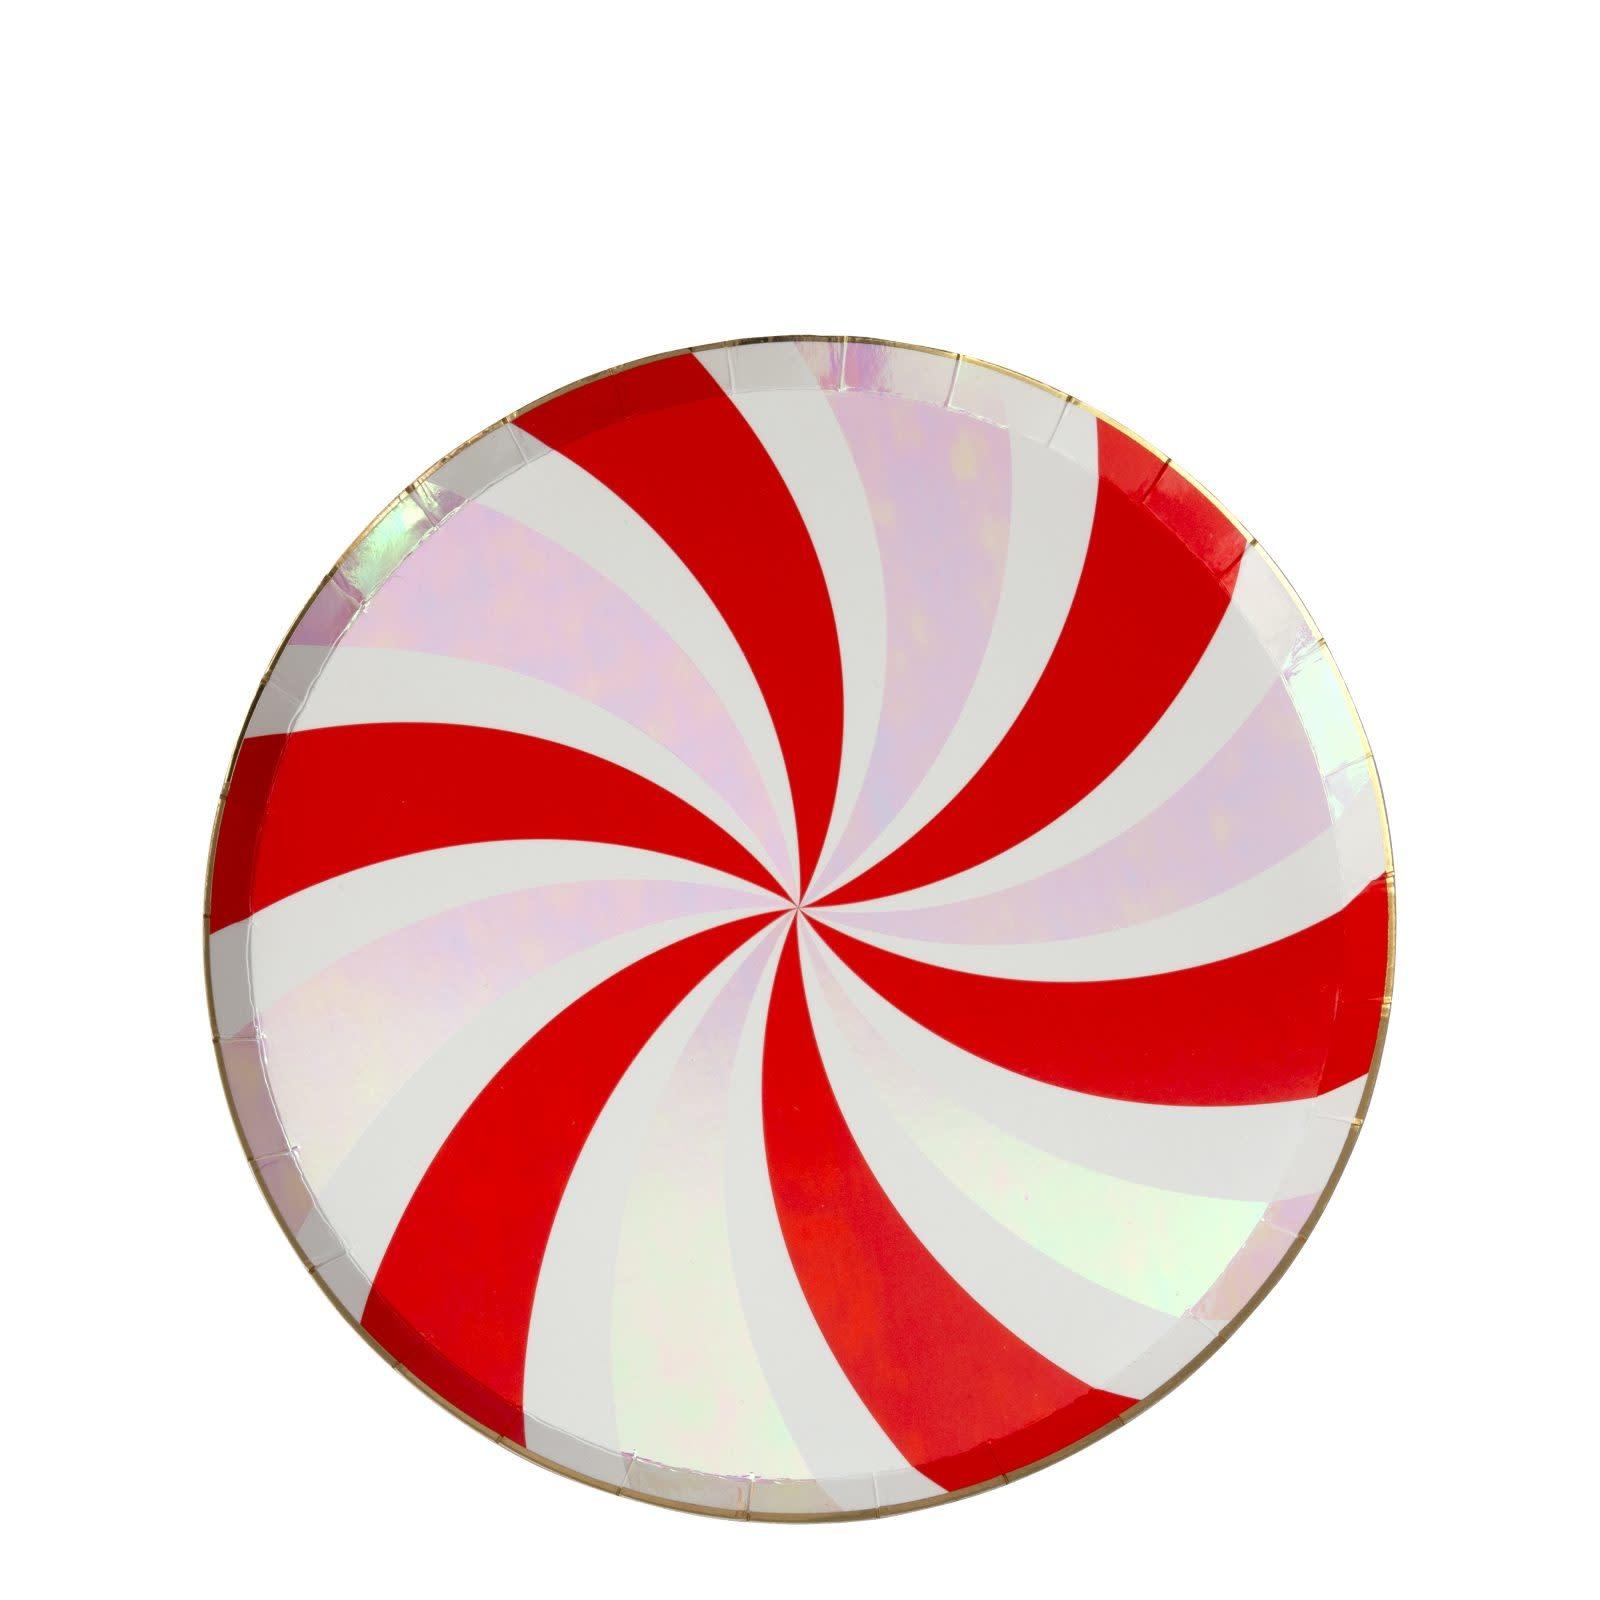 MERIMERI Peppermint swirl plates S